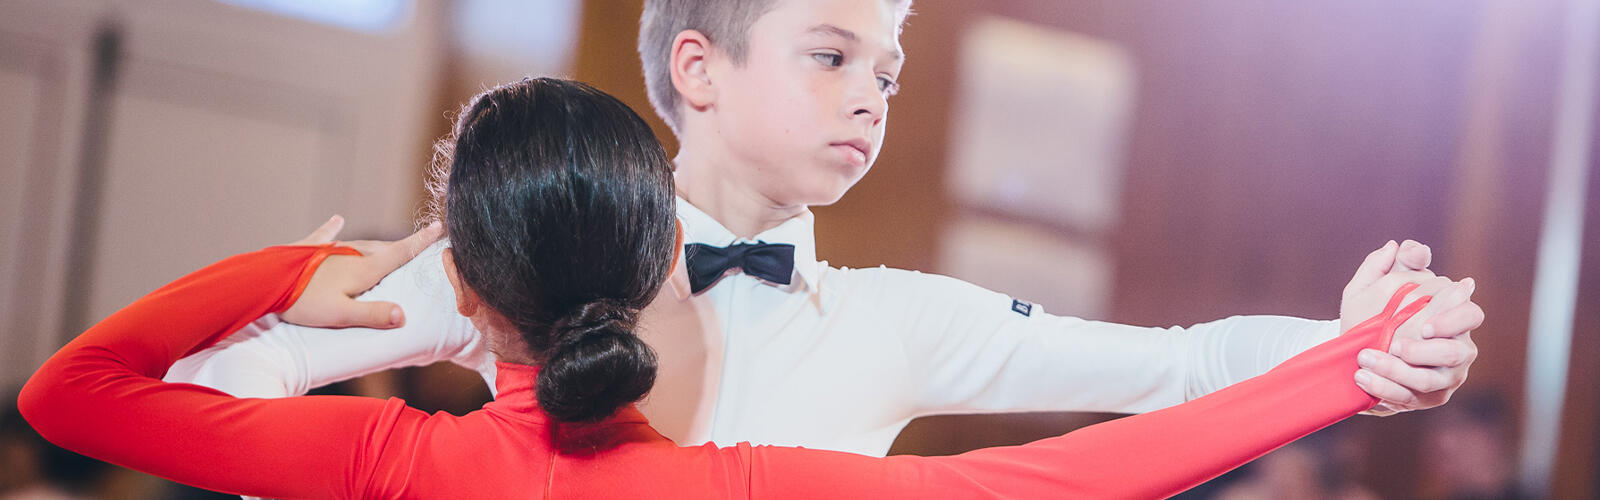 Filip Šulc & Eliška Plesarová COOL DANCE